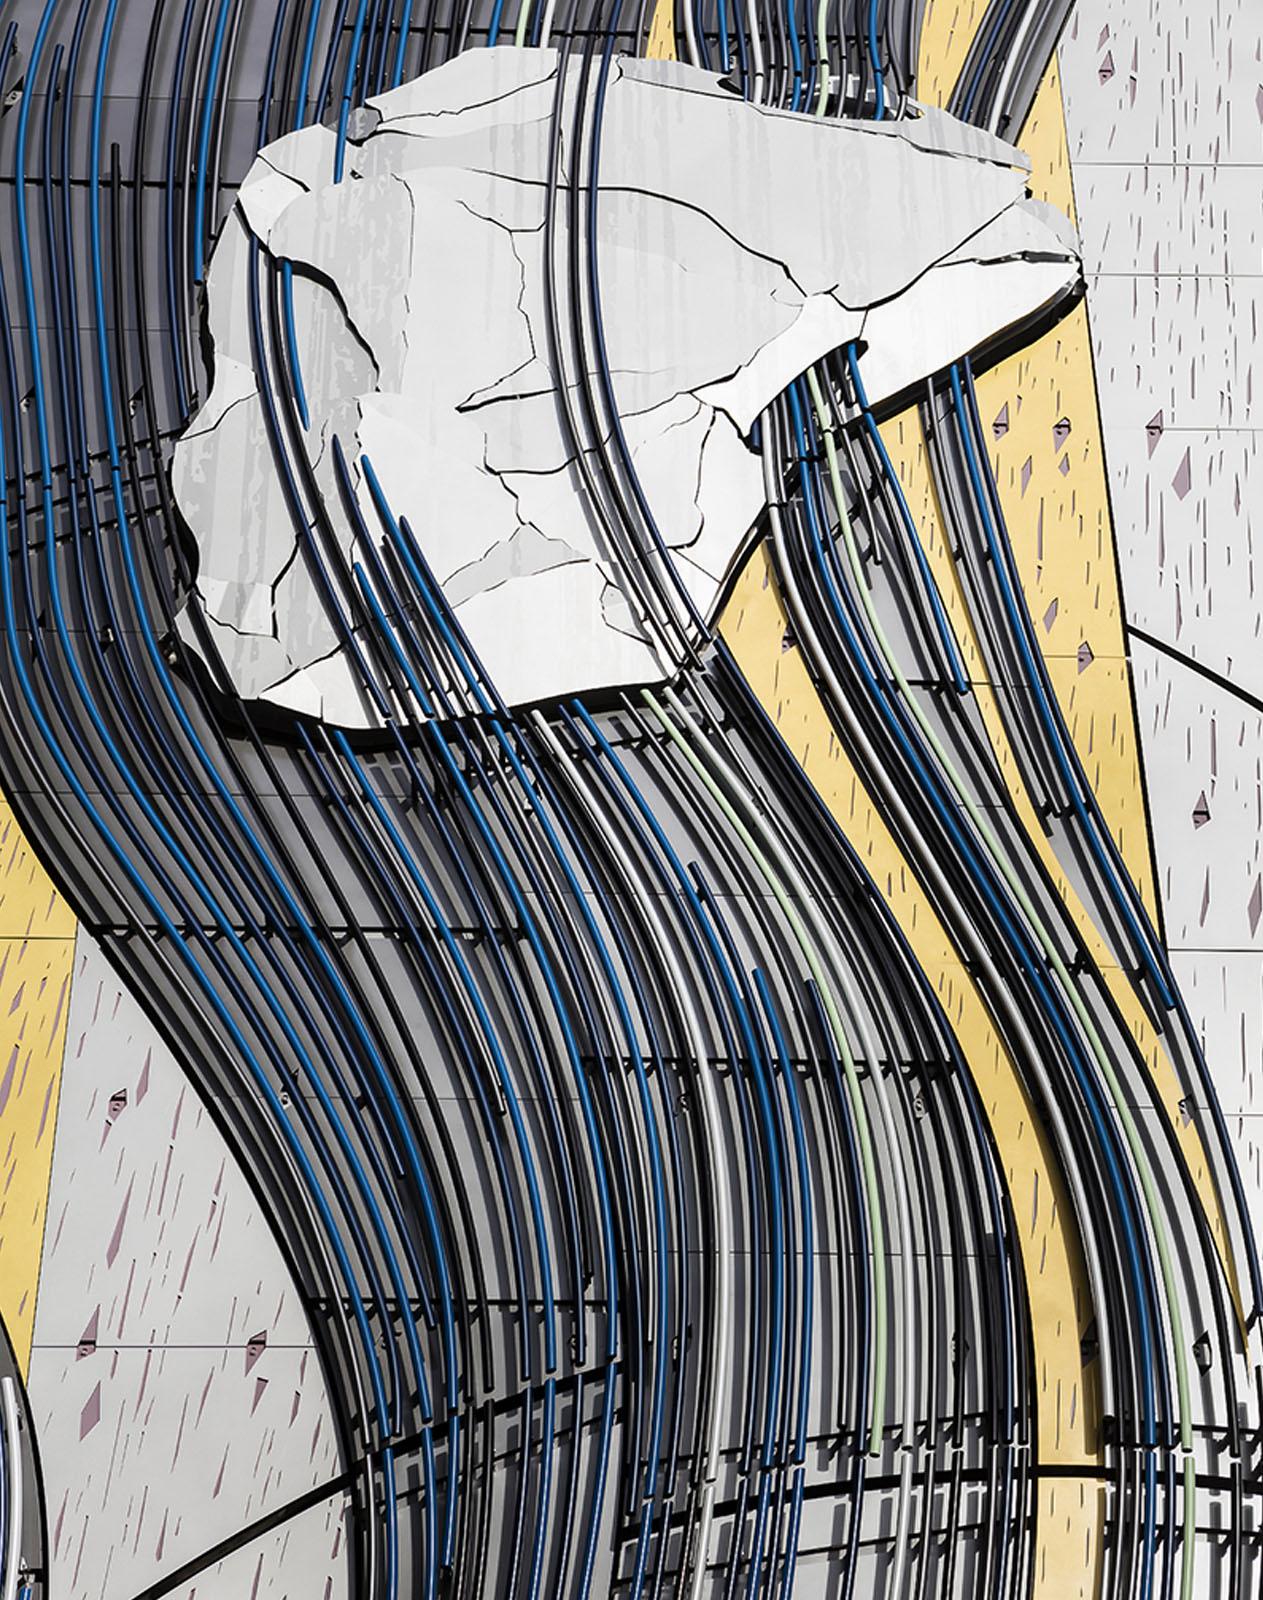 flows-two-ways-stephen-glassman-studio-durst-bjarke-ingels-via-revista-mexico-design-3